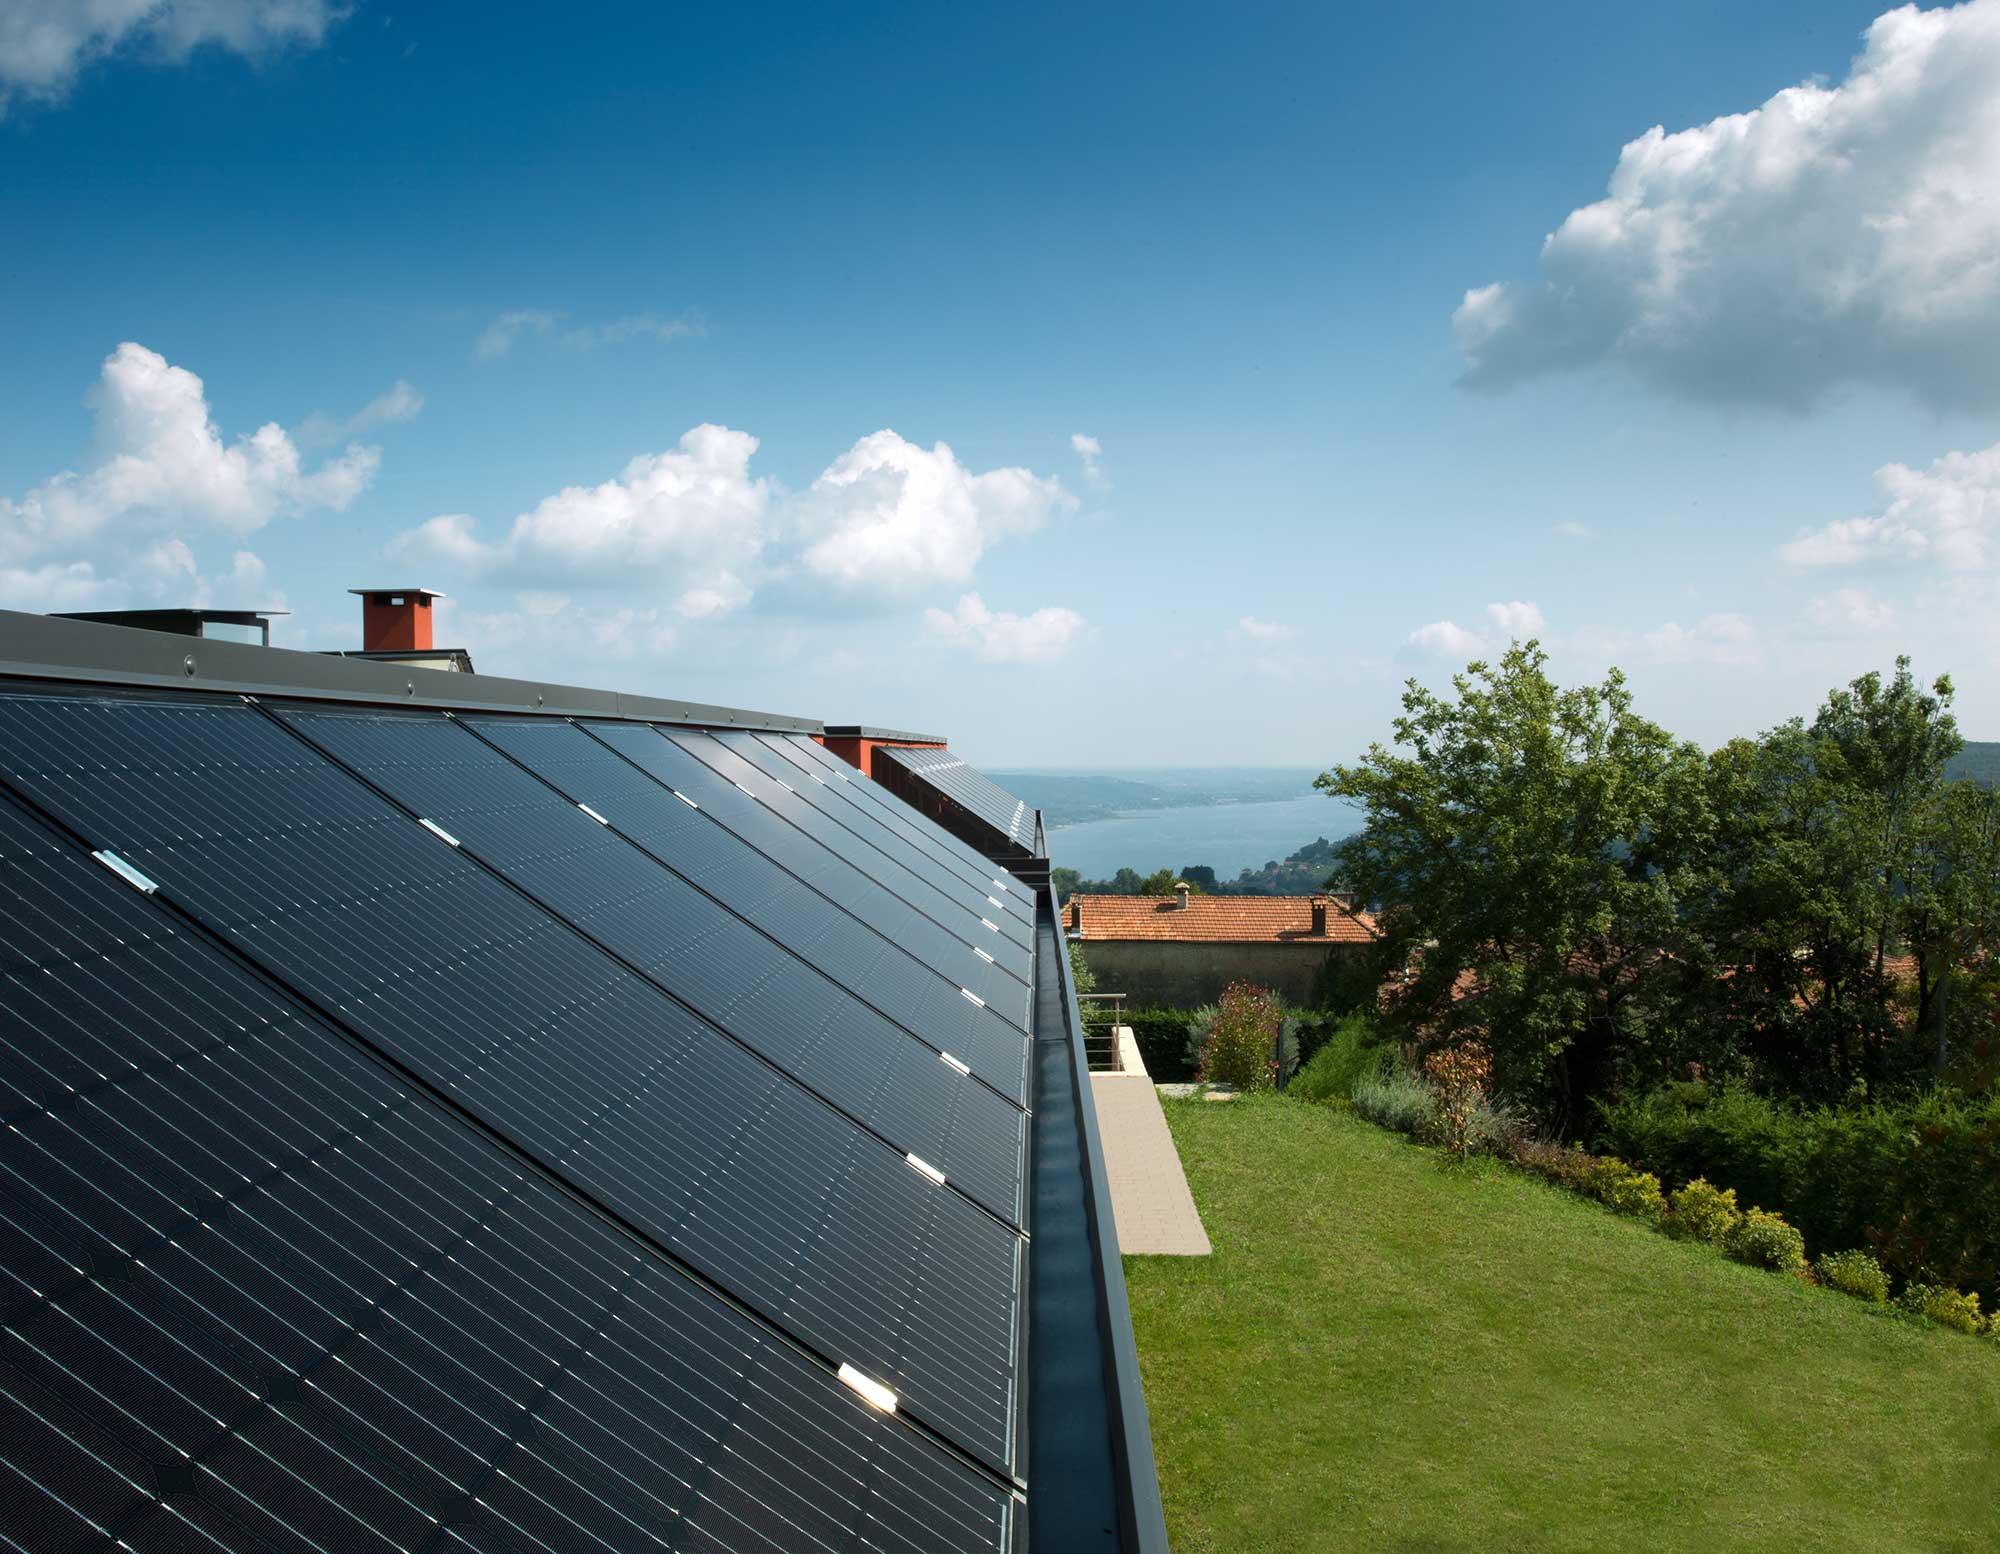 Full Black SolarWorld German Made Solar Panels by Perth Solar Warehouse